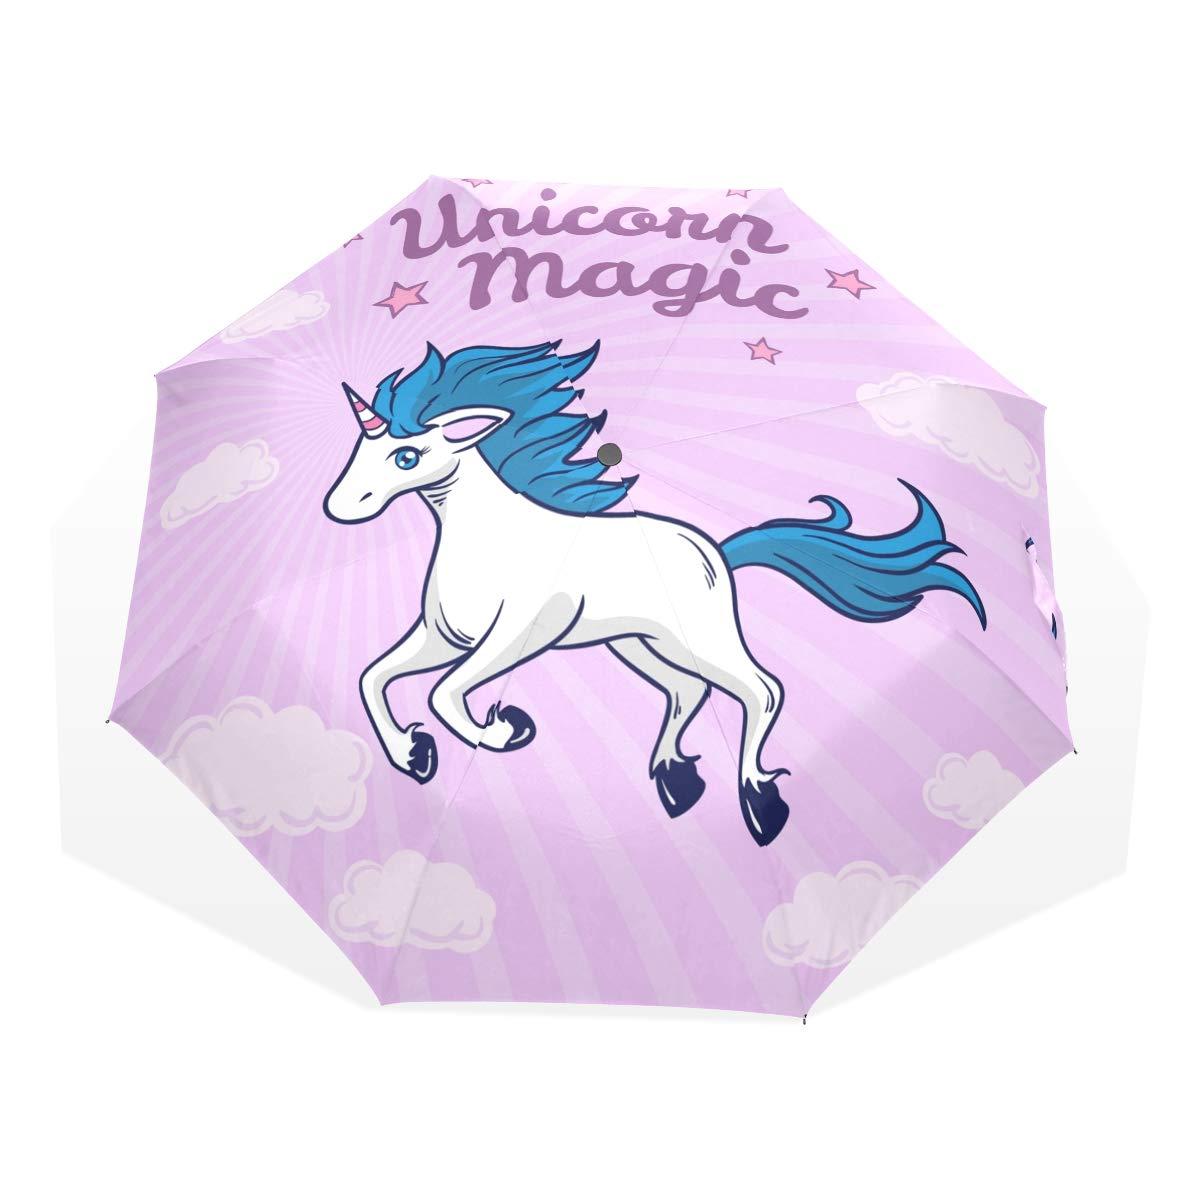 868156aabfdd Amazon.com: CiCily Compact Travel Folding Umbrella Blue Hair Unicorn ...